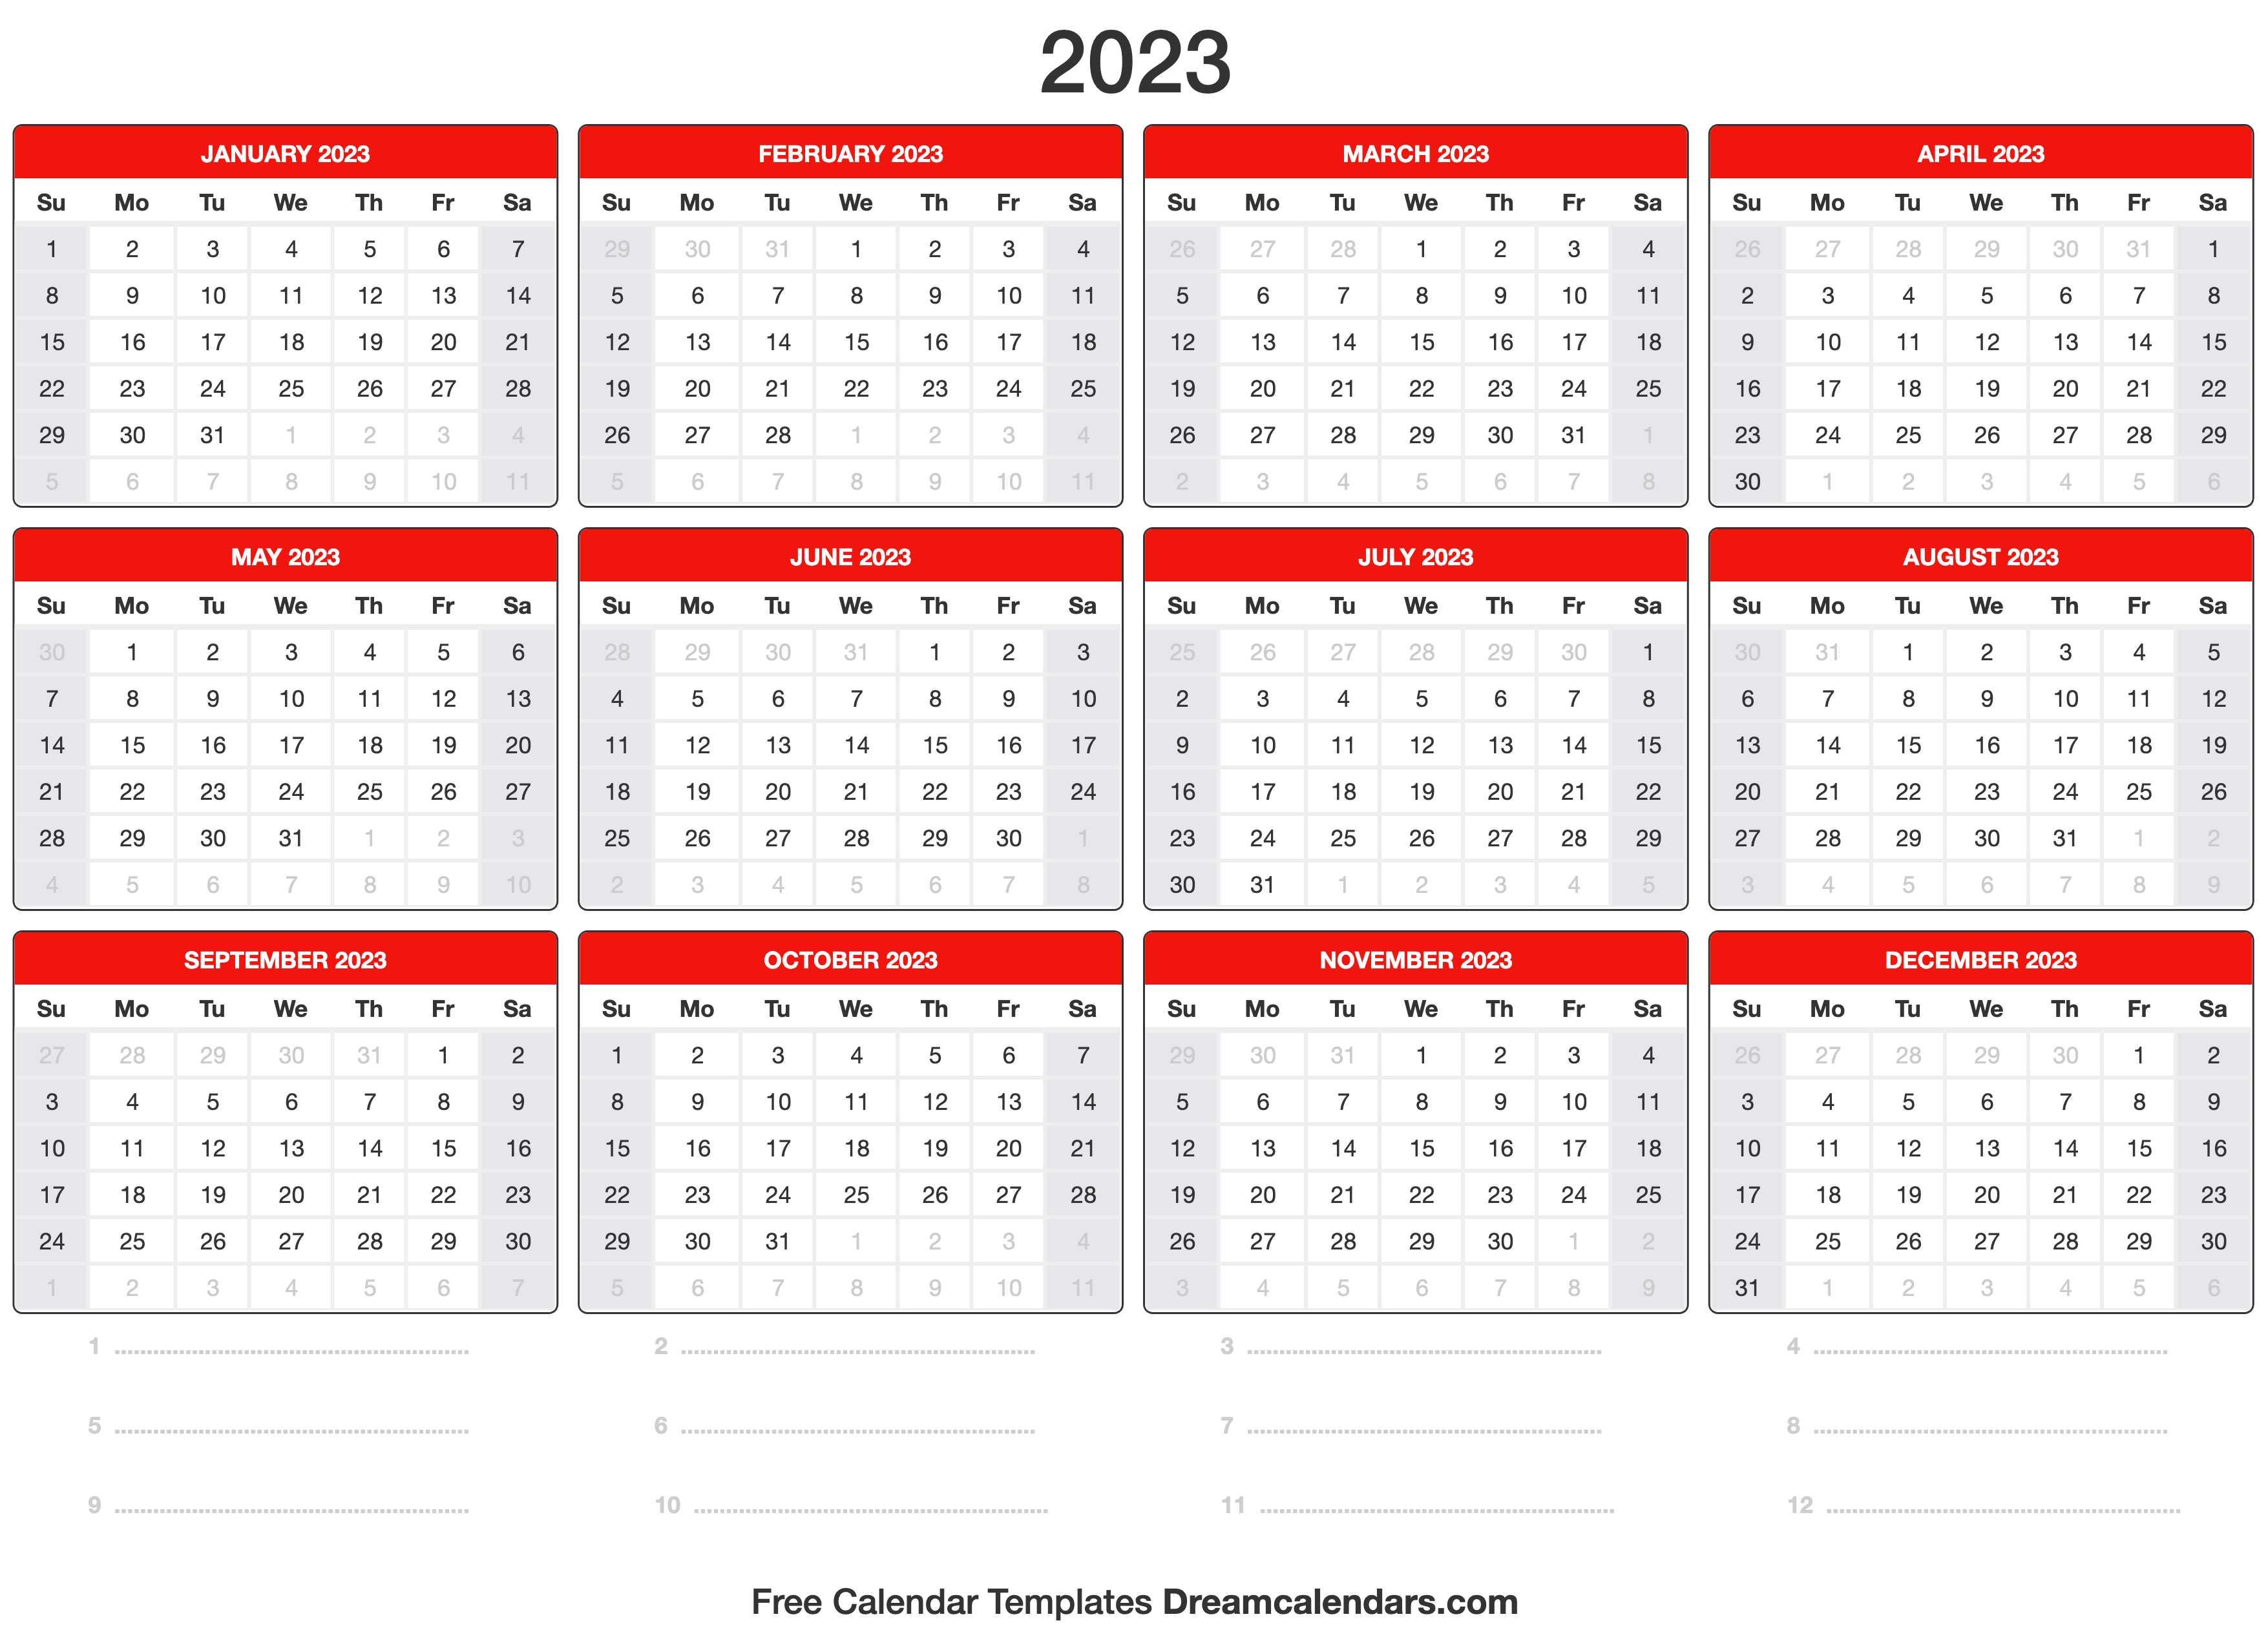 Uc Berkeley 2022 2023 Calendar.2023 Calendar